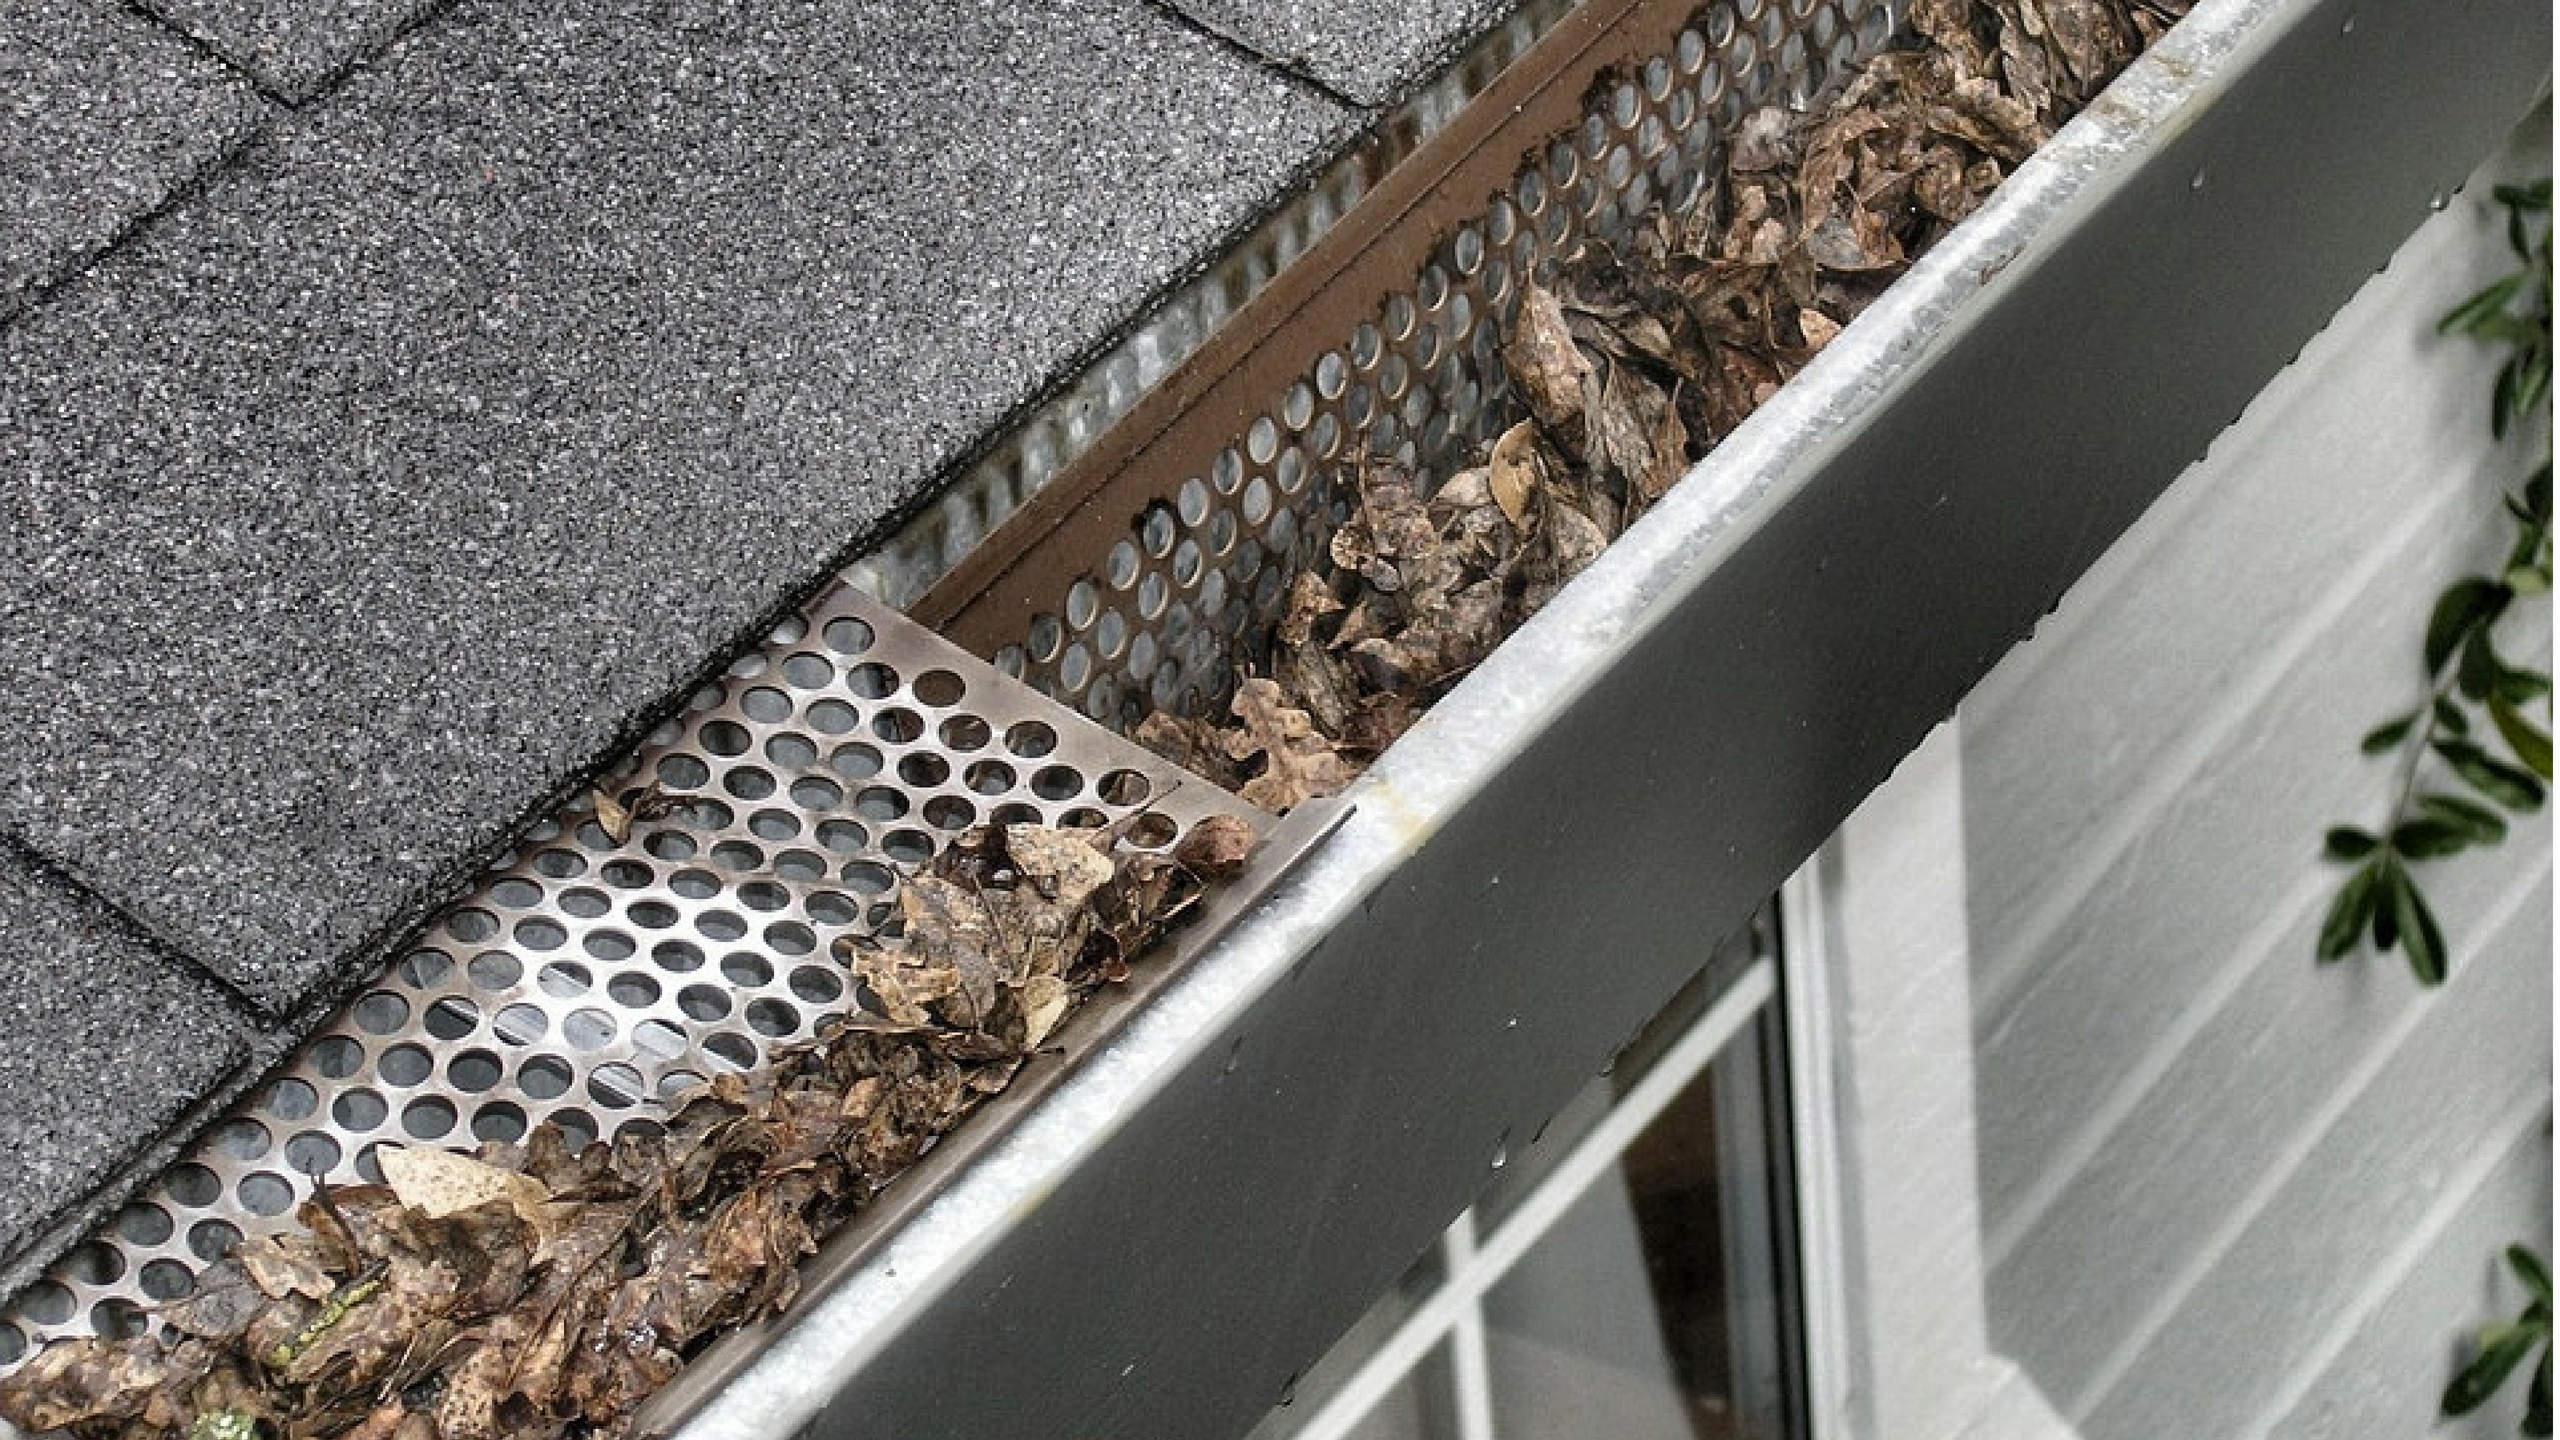 Bevorzugt Tipps vom Dachdecker - Ratgeber bei verstopften Dachrinnen GH17